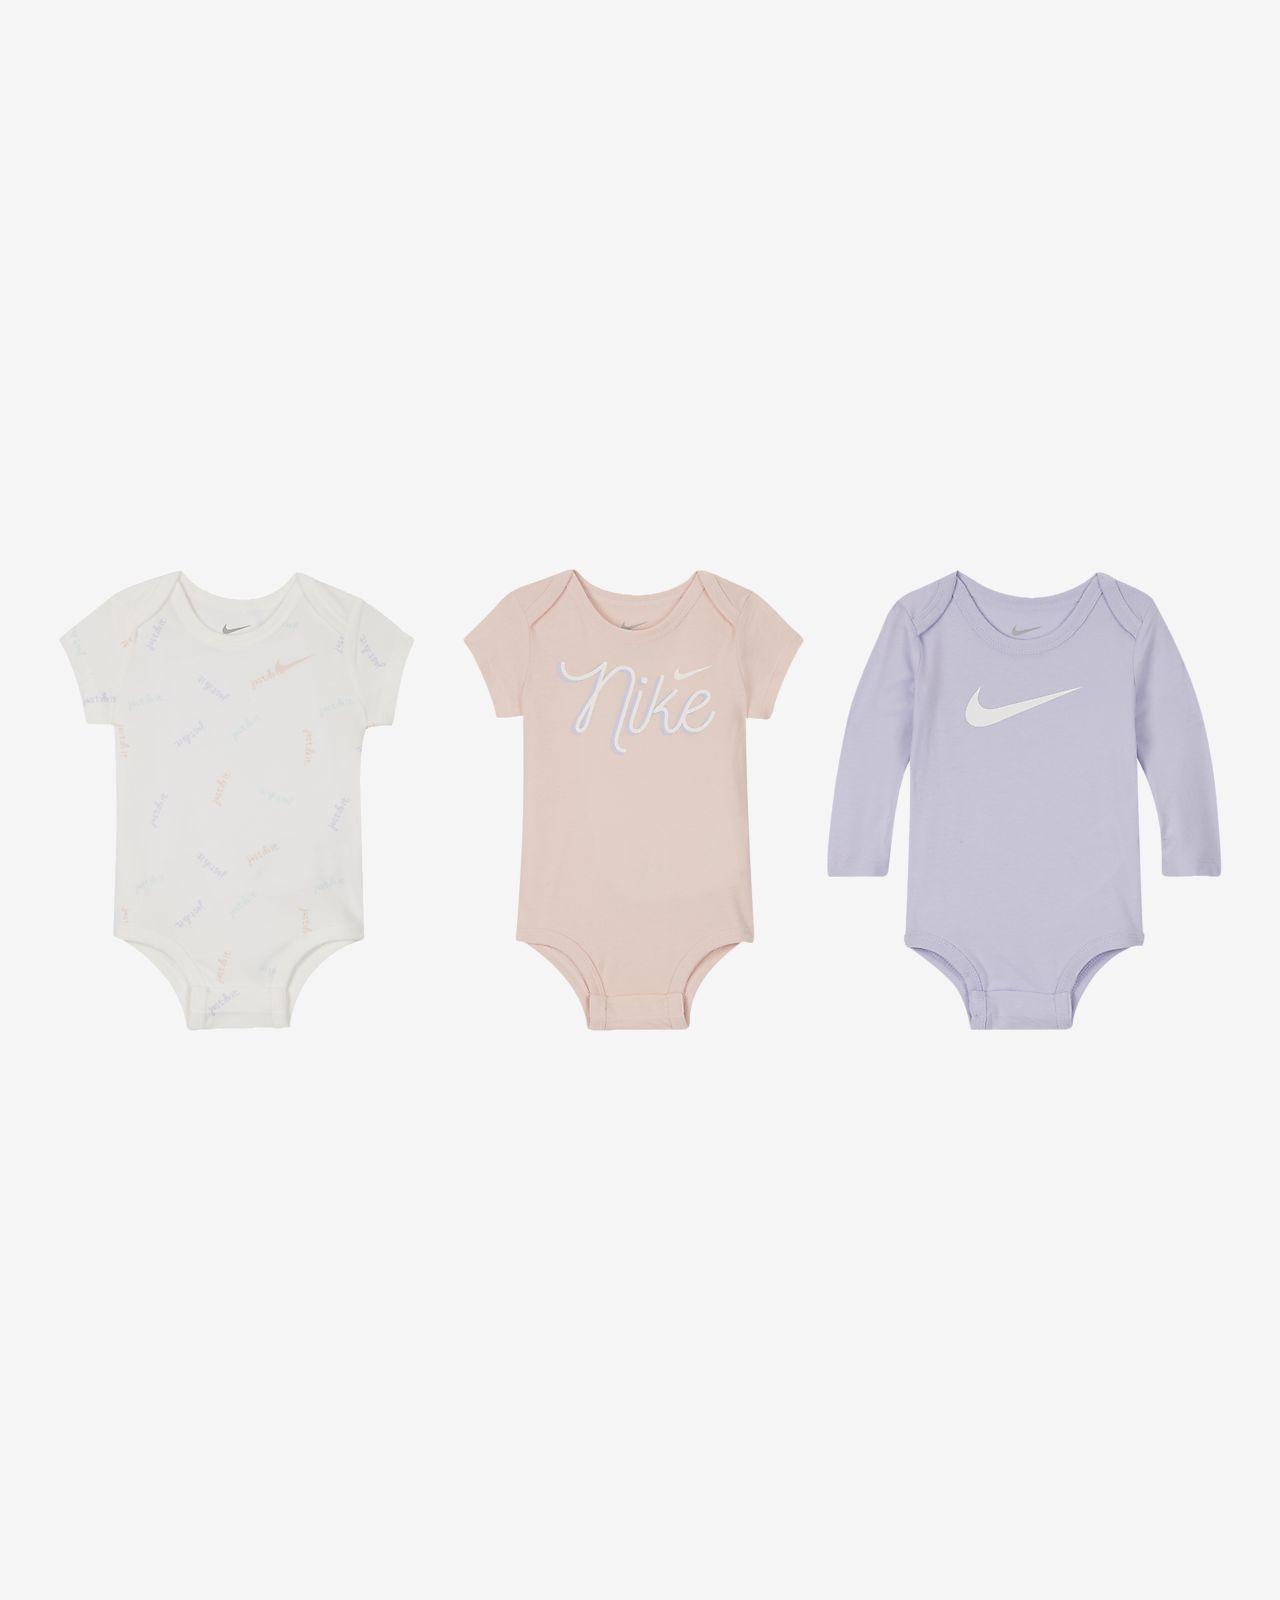 Nike Mono (3 unidades) - Bebé (0-9 M)